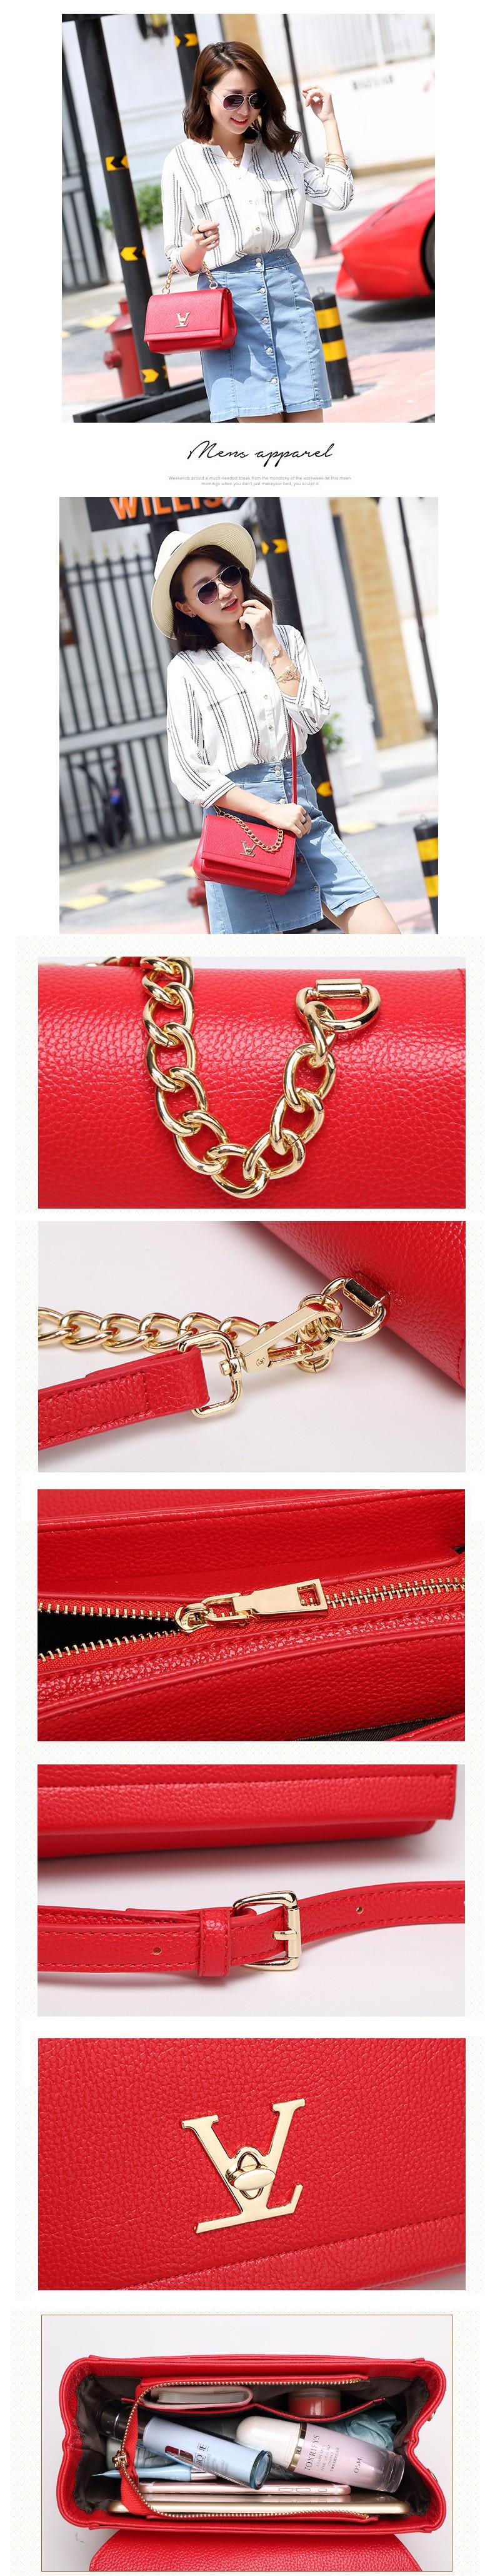 High Quality Loui Ladies Deform Litchi profile Bats Bag Women Chain Shoulder Leather Purses Handbags Bolsas Feminina Clutch (3)